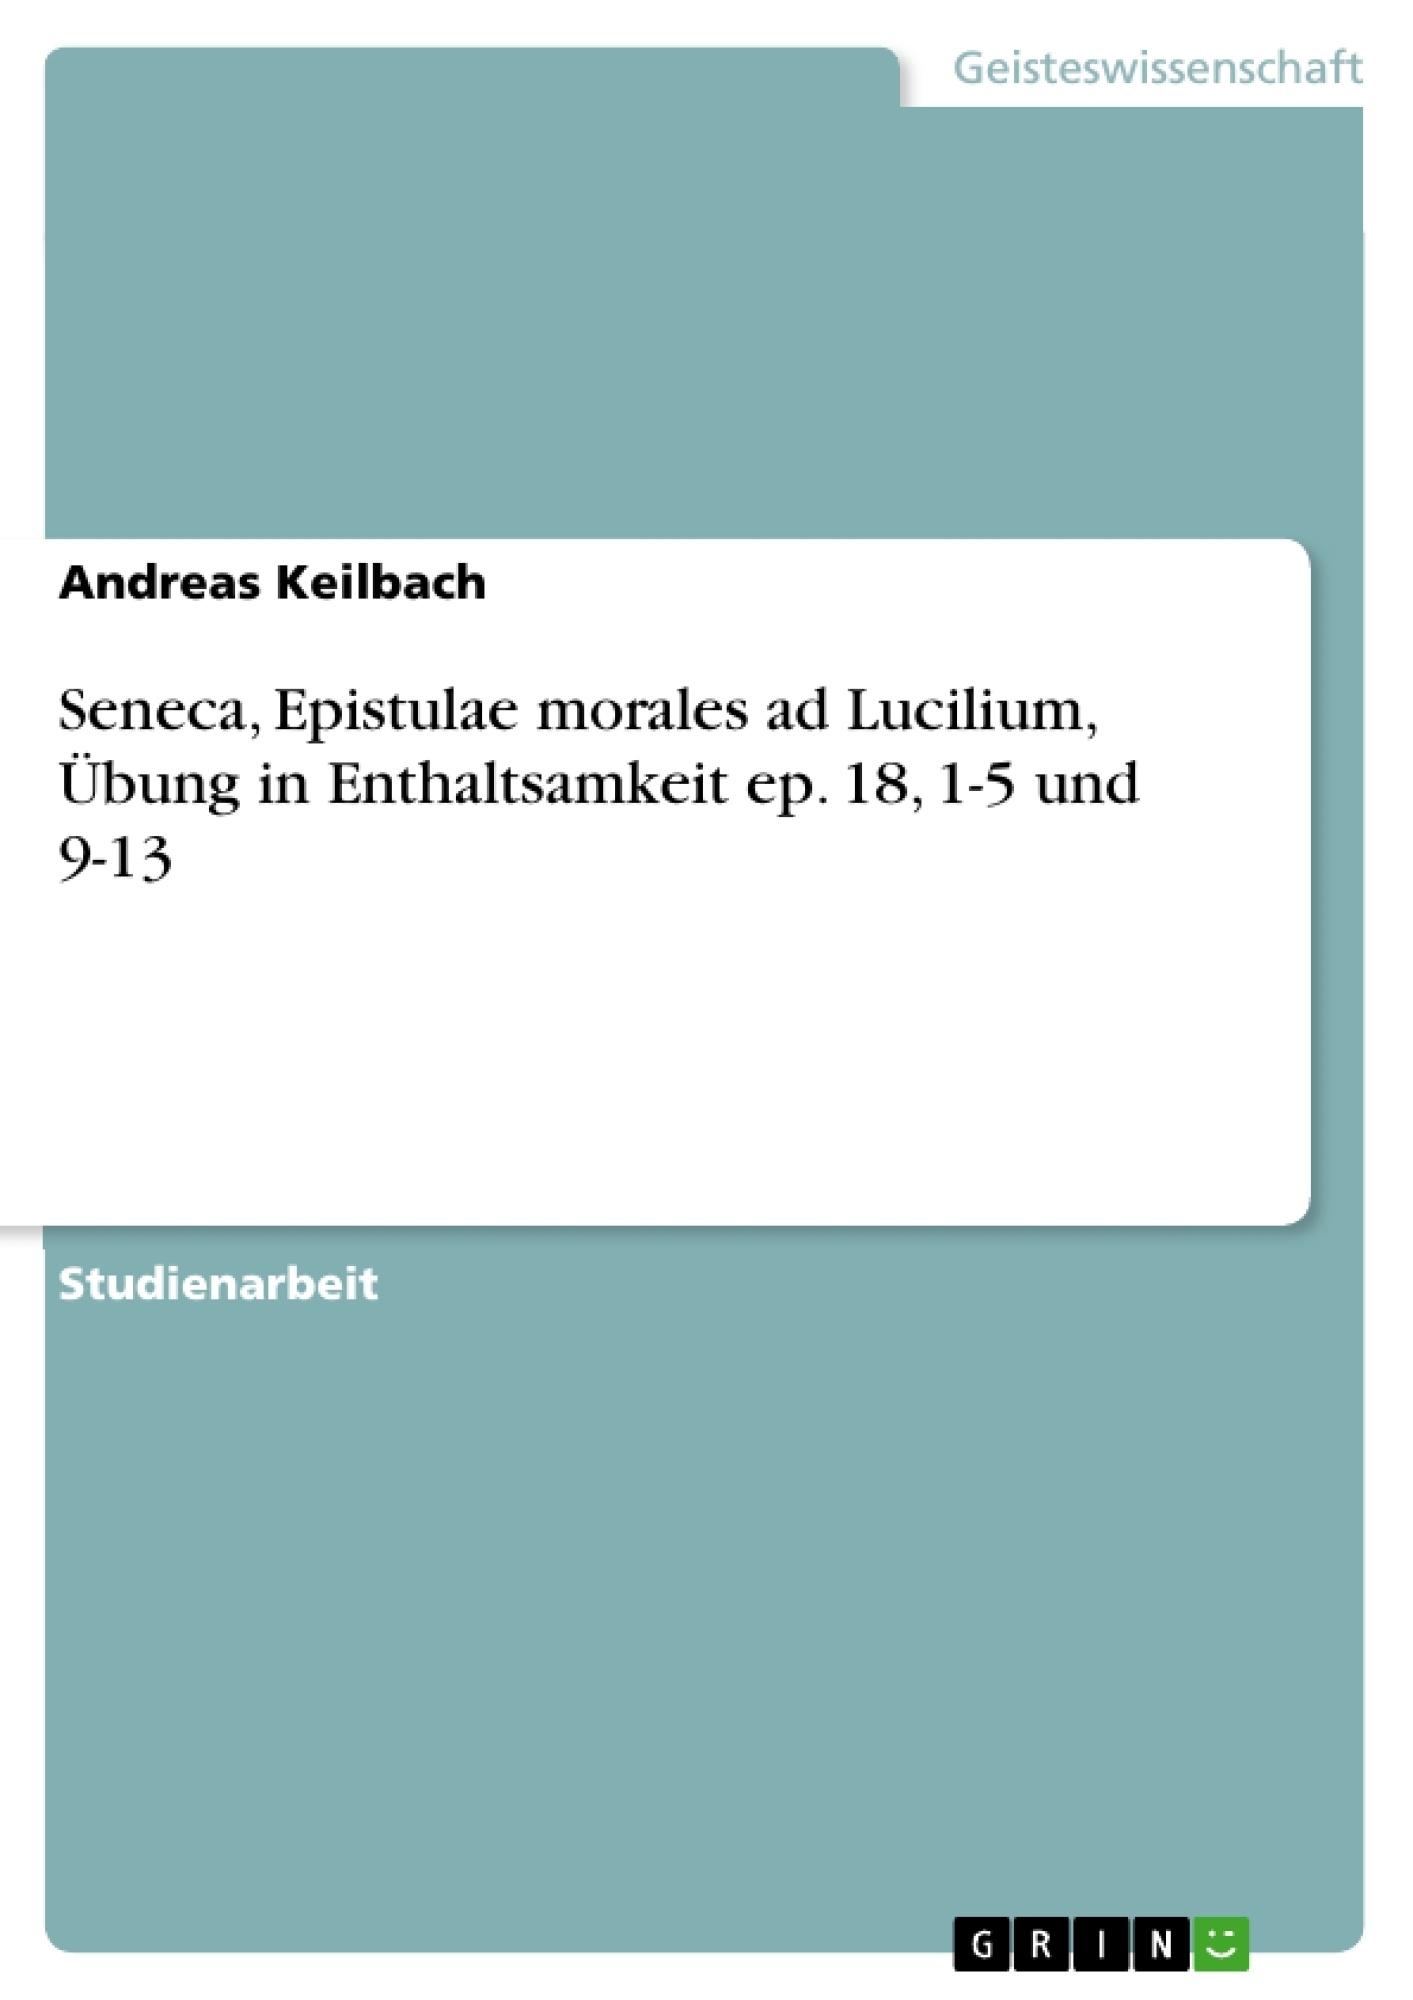 Titel: Seneca, Epistulae morales ad Lucilium, Übung in Enthaltsamkeit ep. 18, 1-5 und 9-13